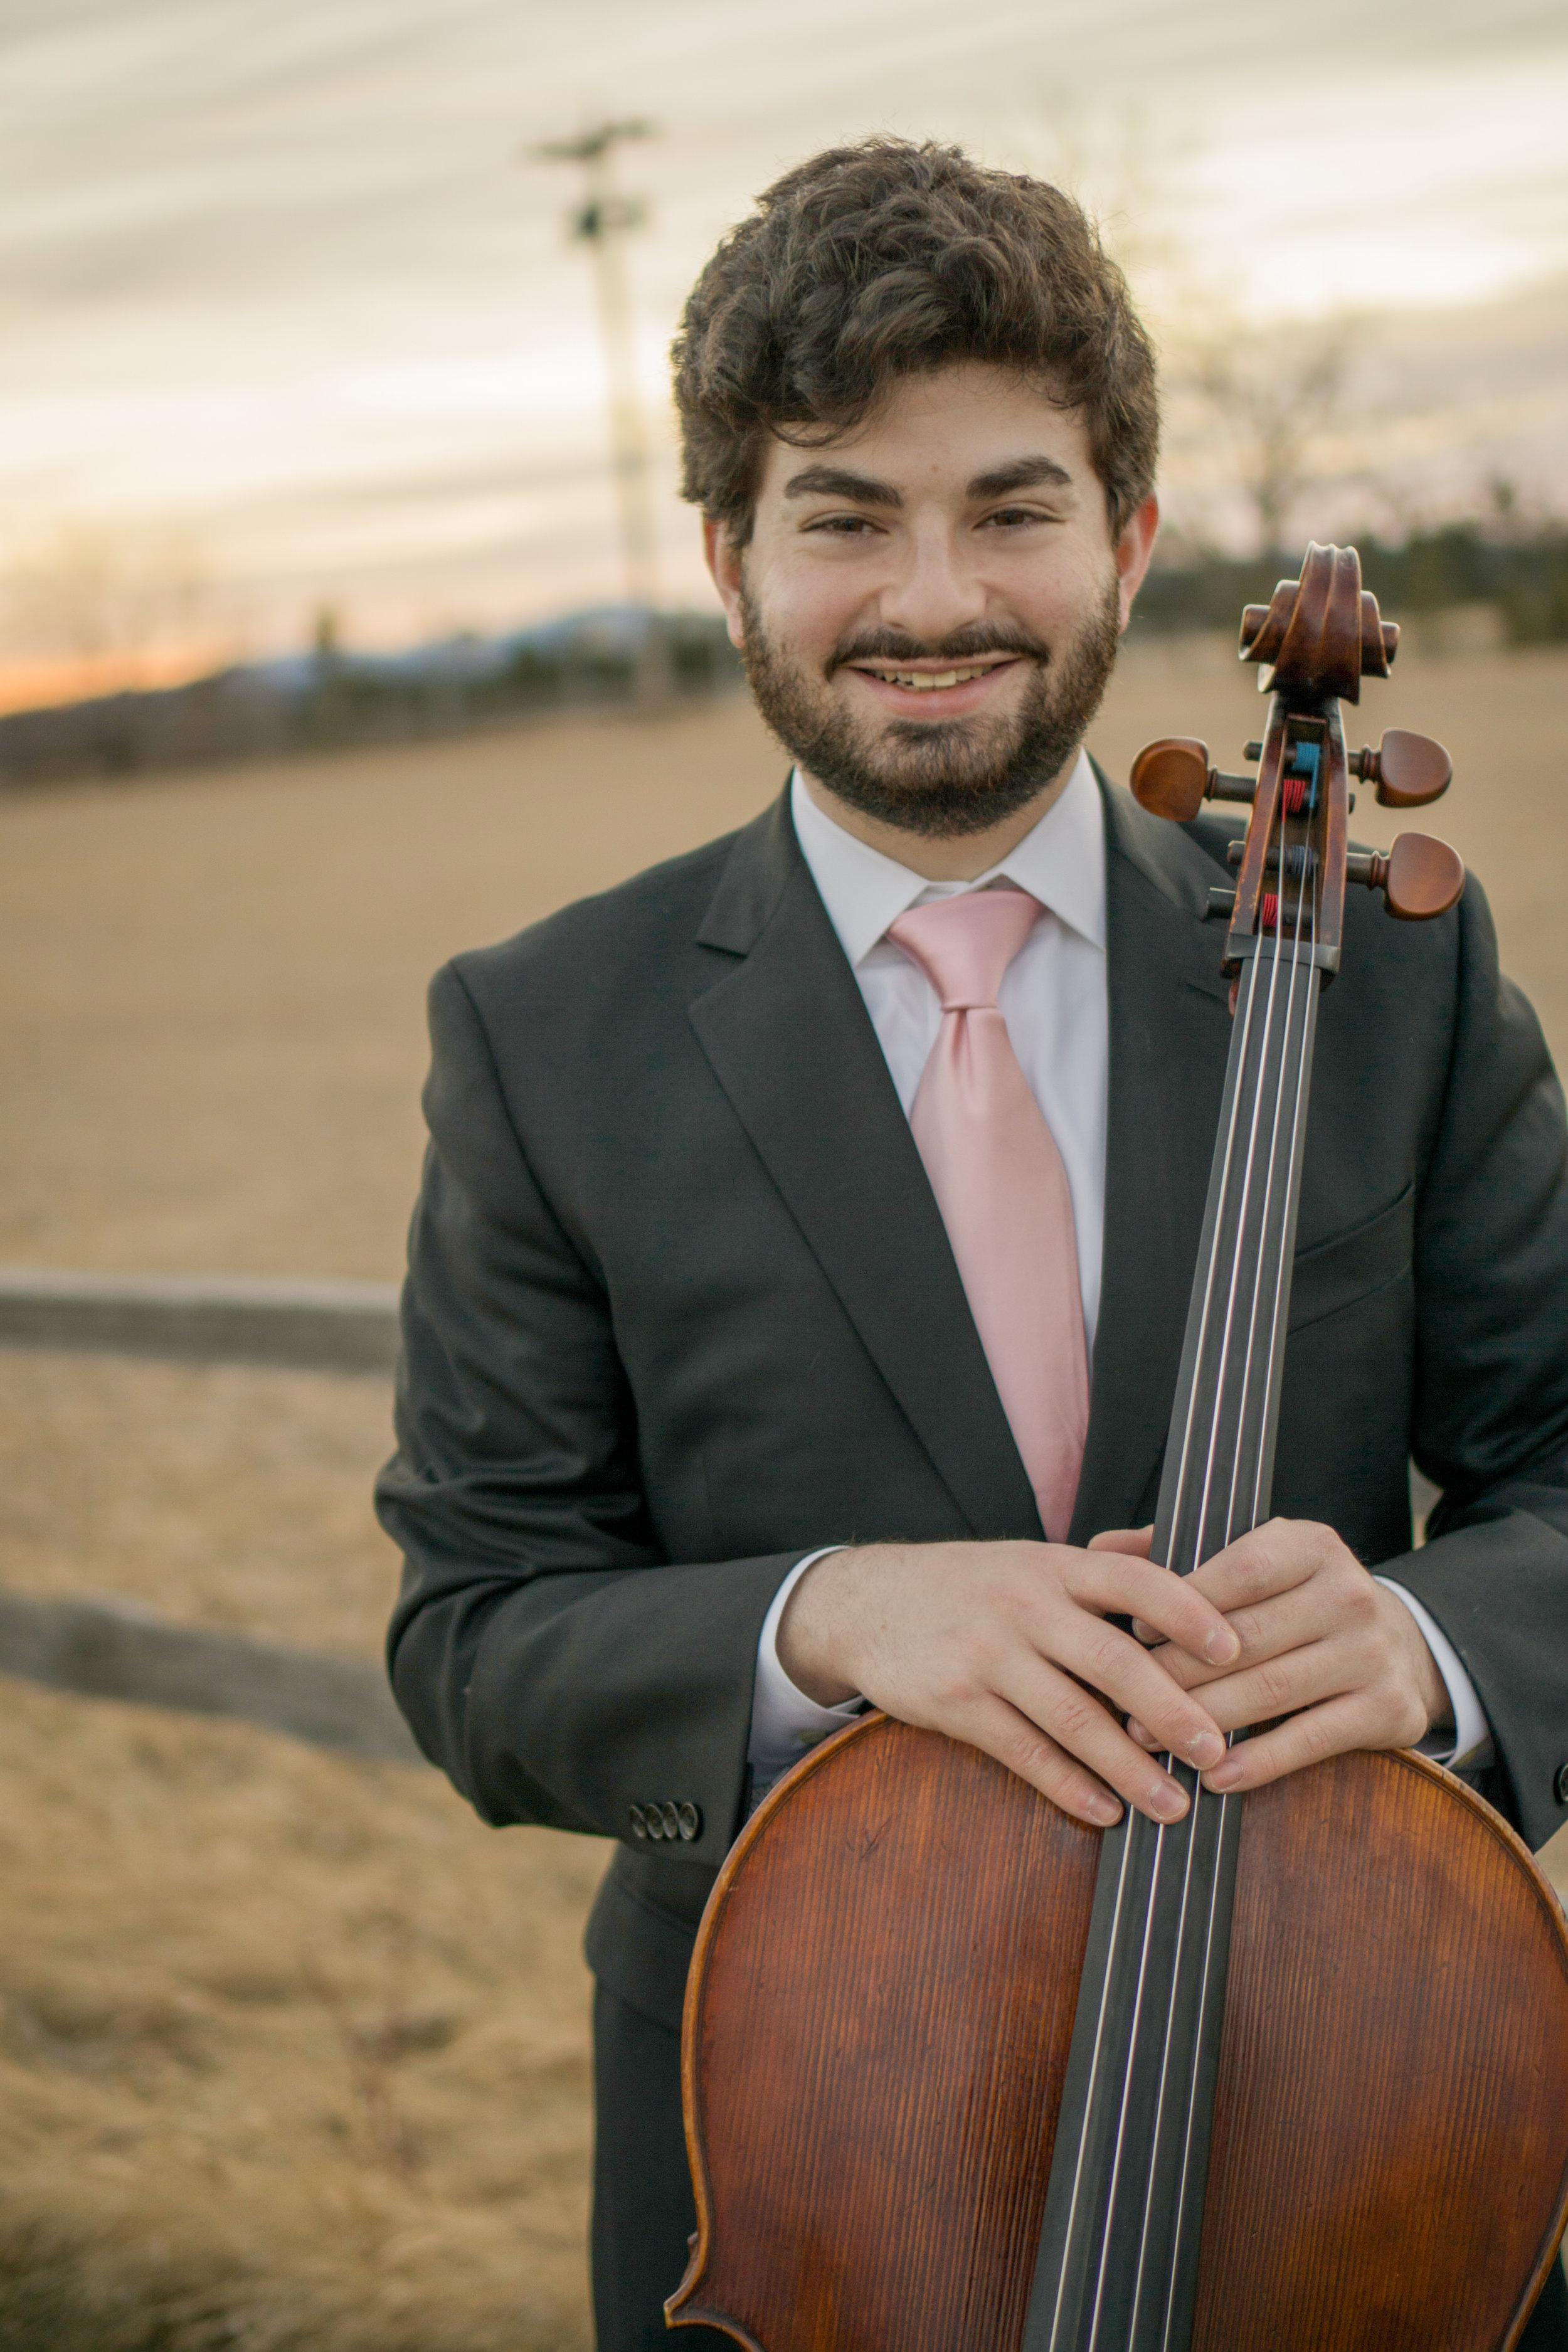 William Kass, Cello